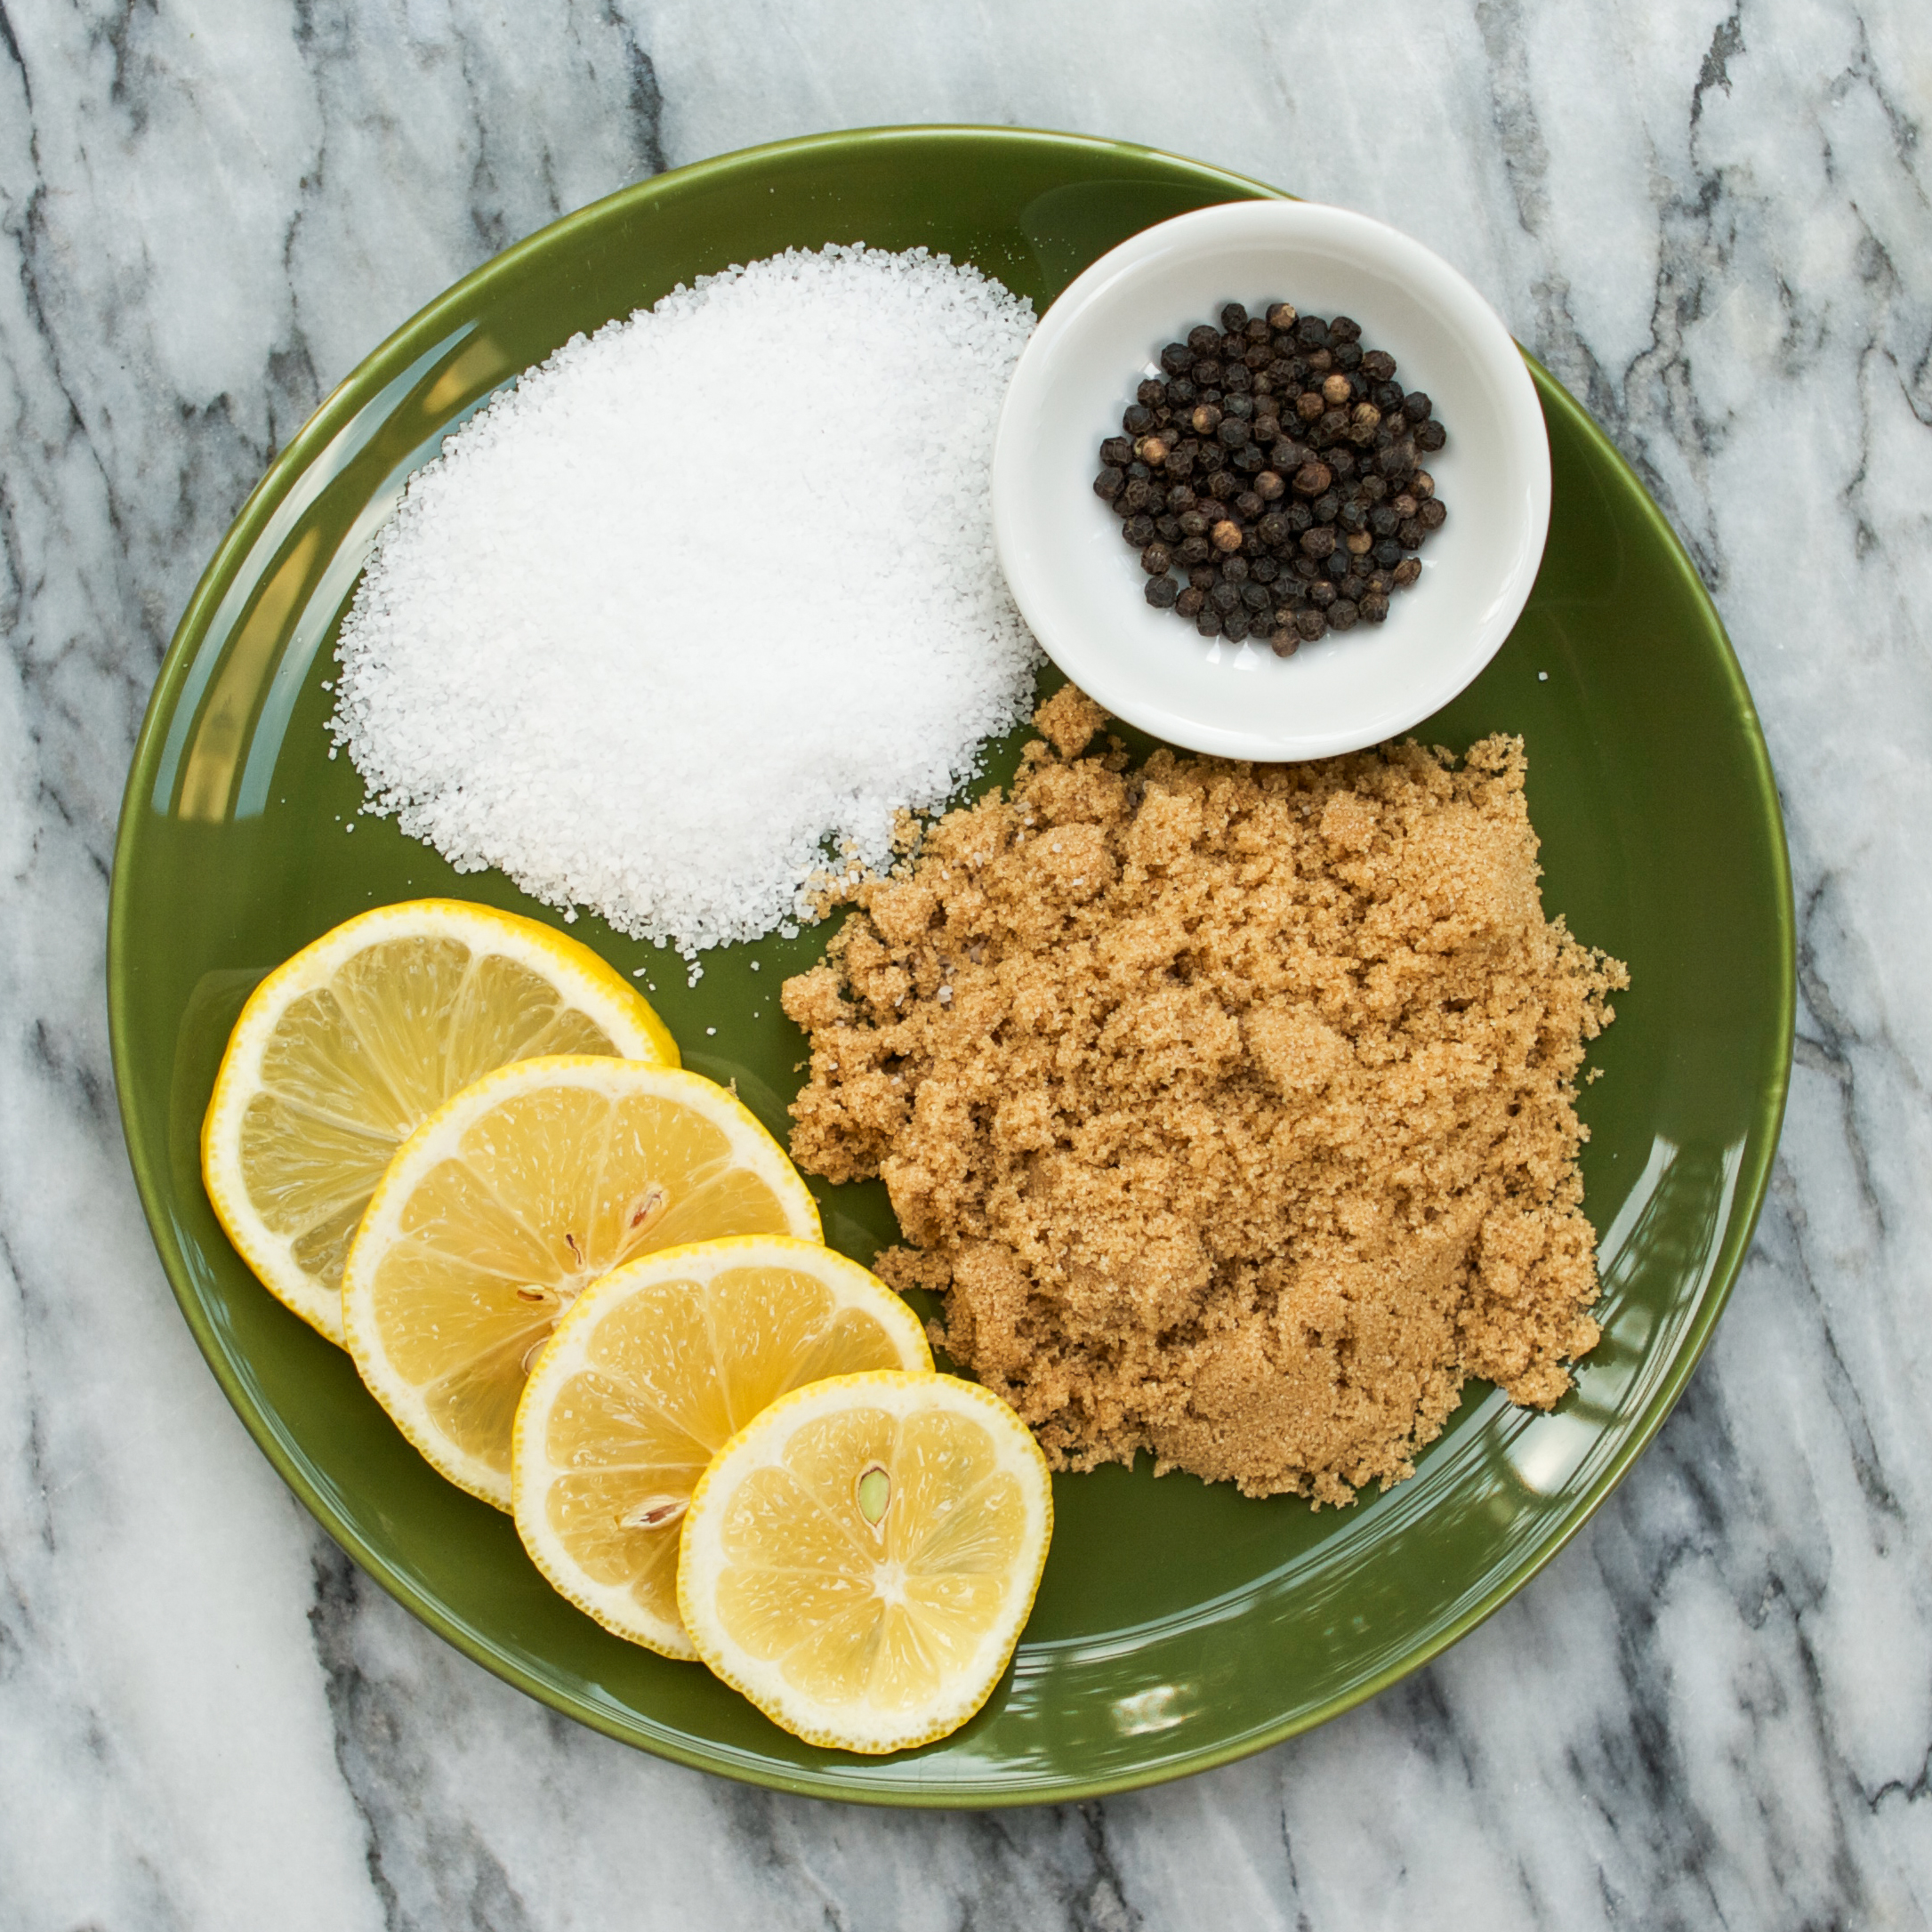 Other ingredients for tea brine